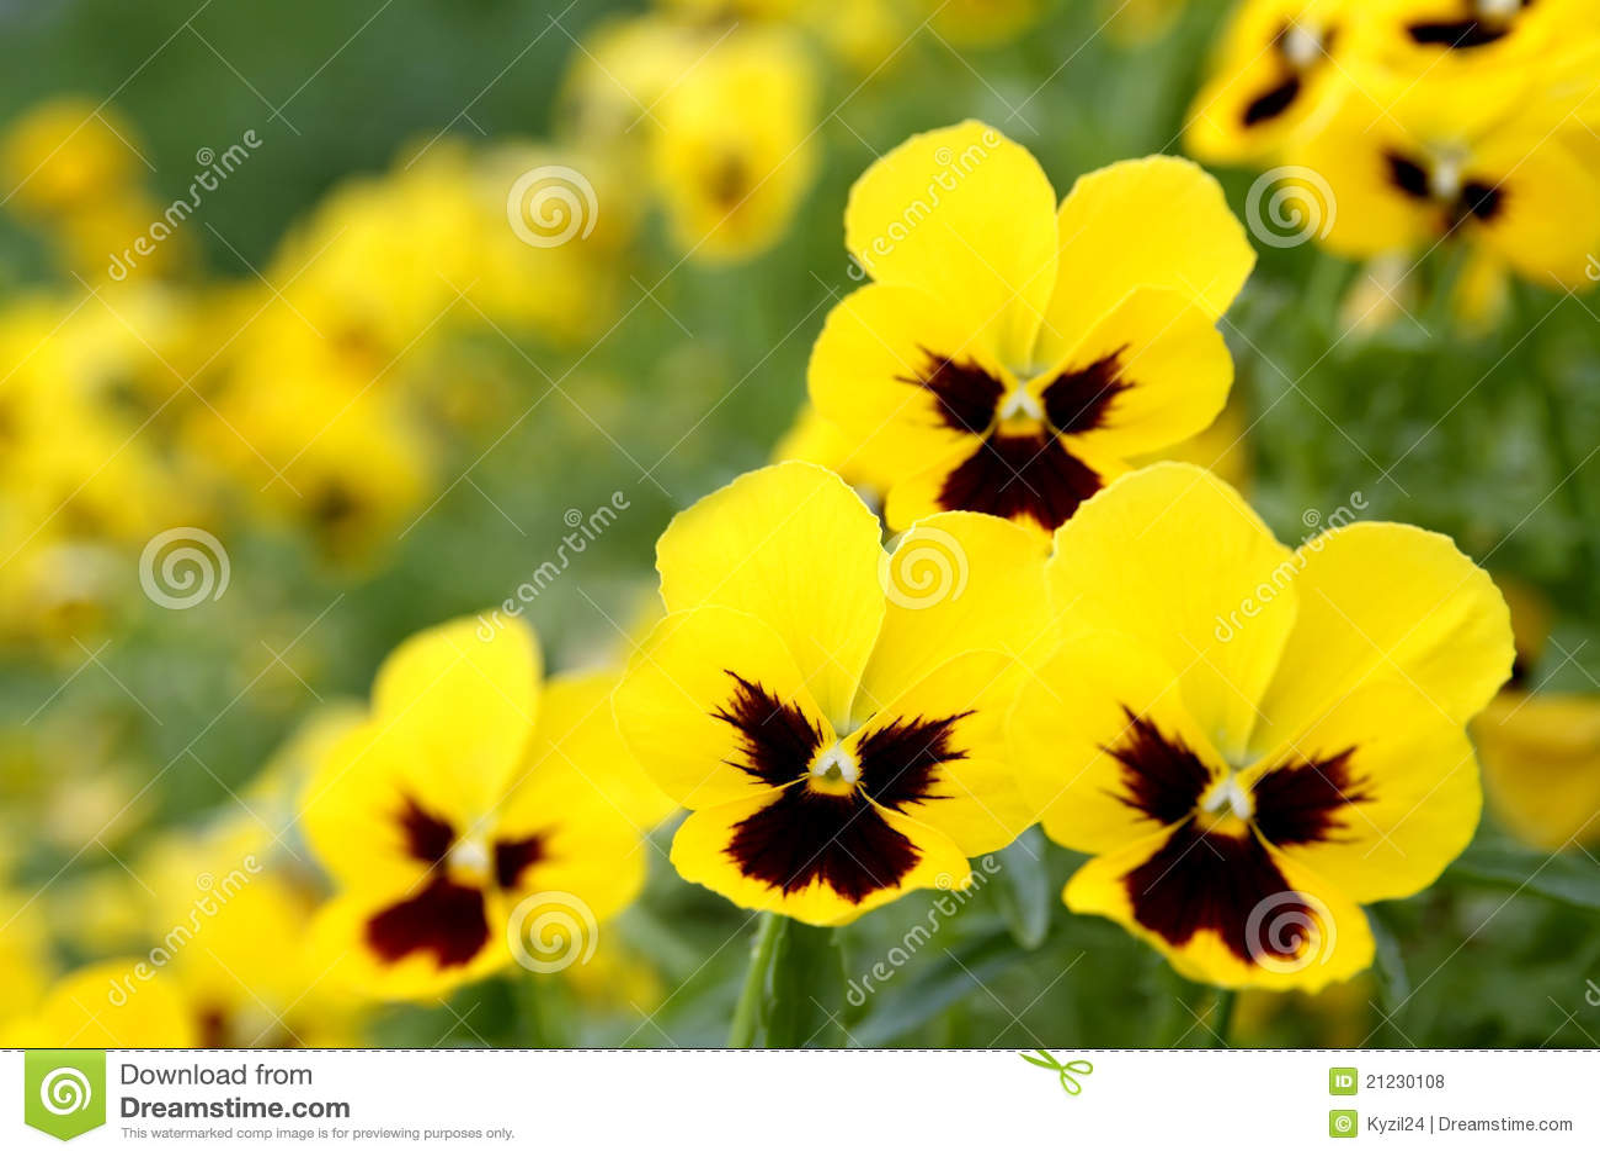 Yellow Pansy Flowers Stock Photo Image Of Beautiful 21230108